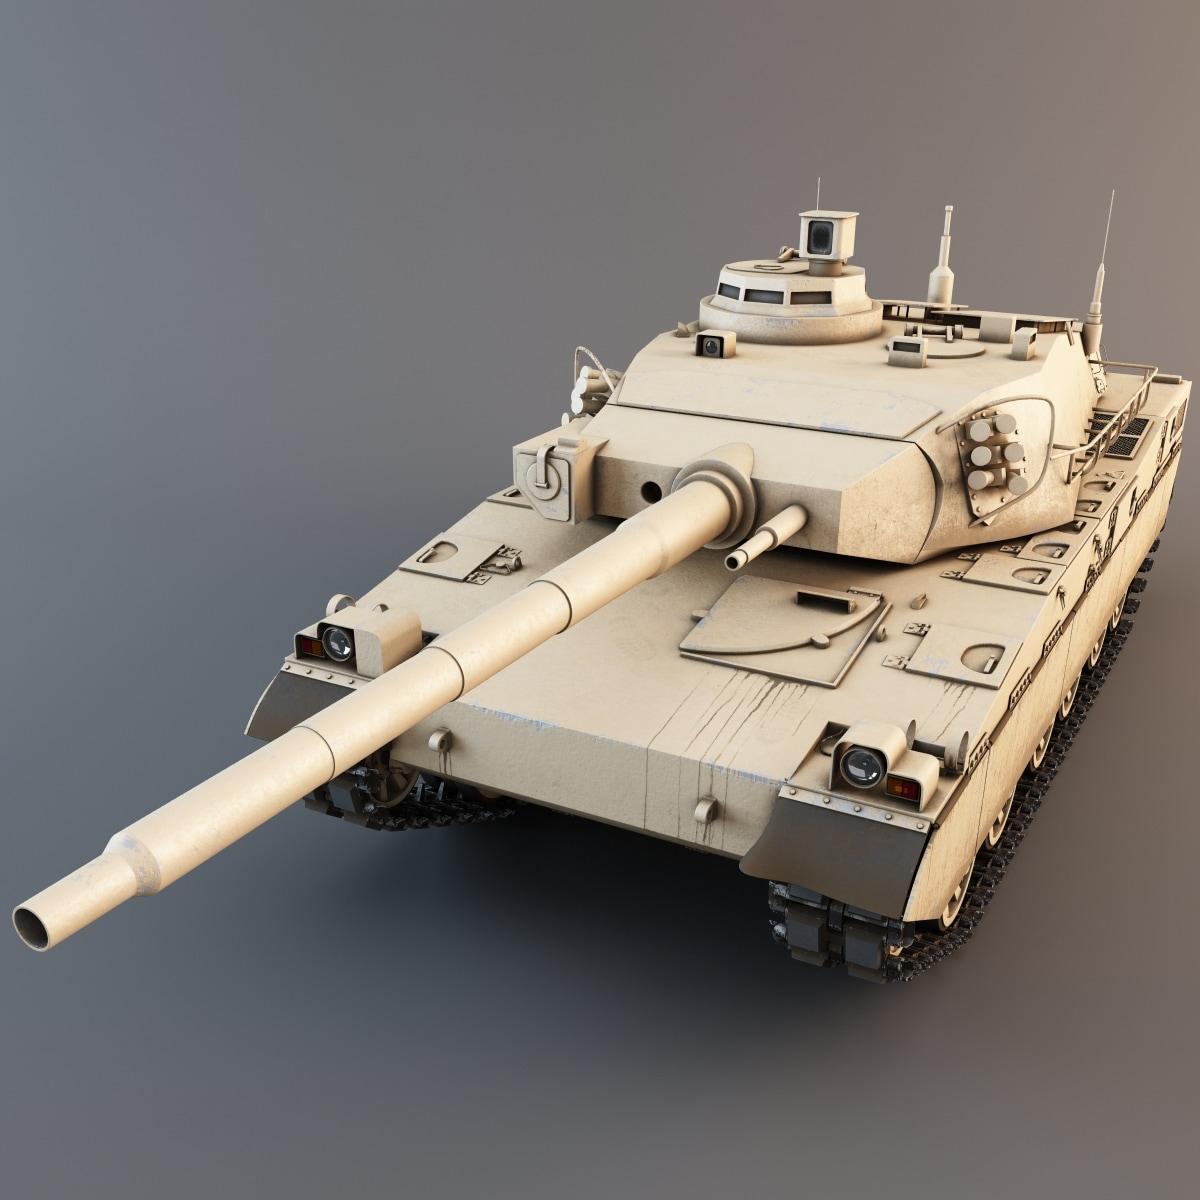 3d amx-40 french main battle tank